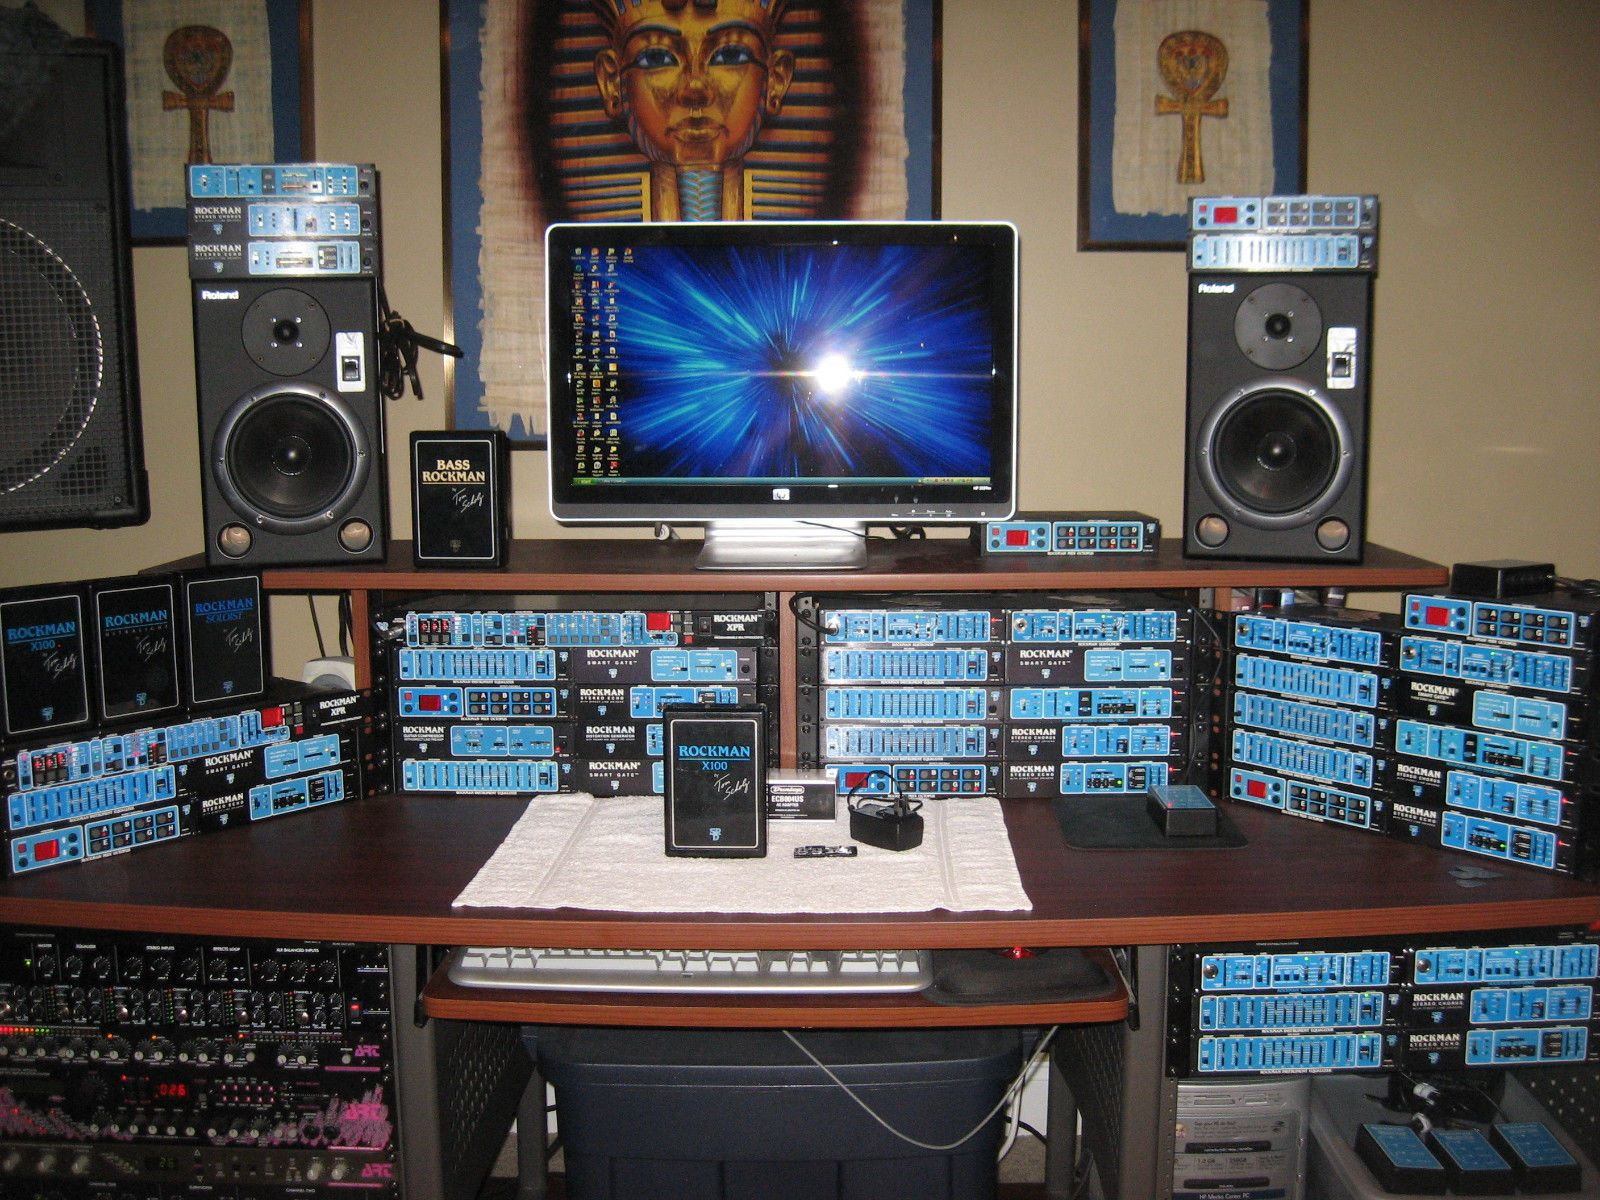 tom scholz rockman guitar pedals pedalboard types of guitar. Black Bedroom Furniture Sets. Home Design Ideas